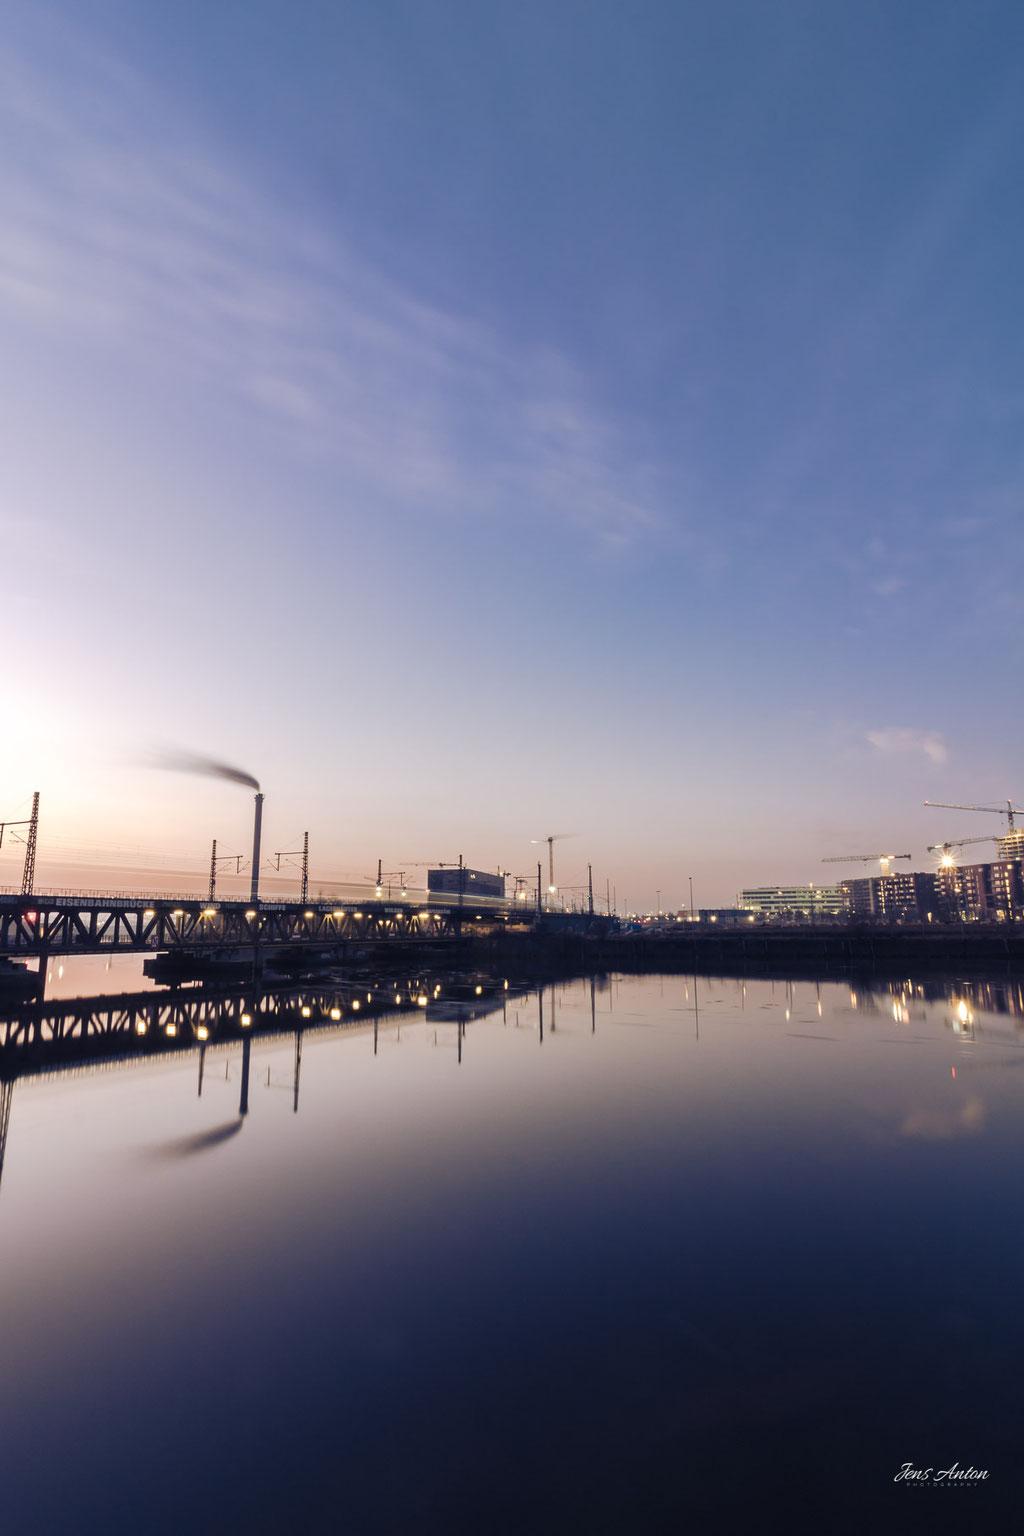 Oberhafenbrücke Eisenbahnbrücke am Morgen Hamburg